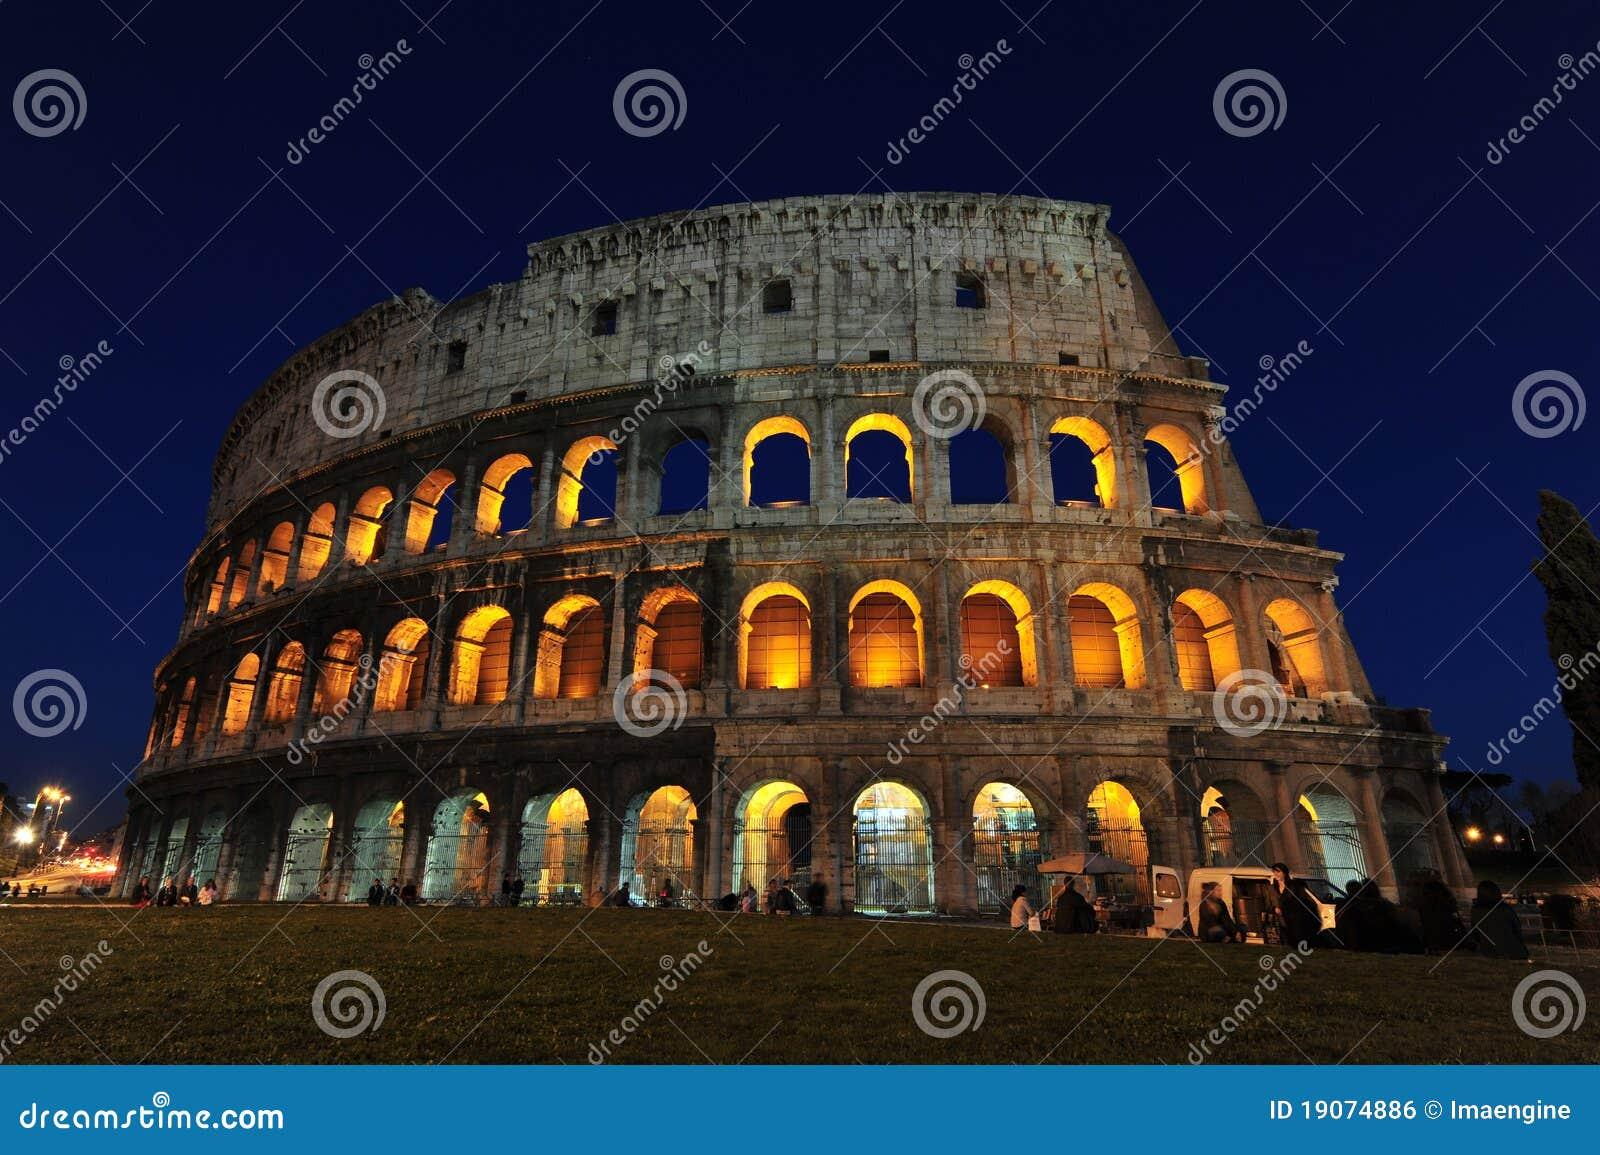 The colosseum - Magic nights in Rome